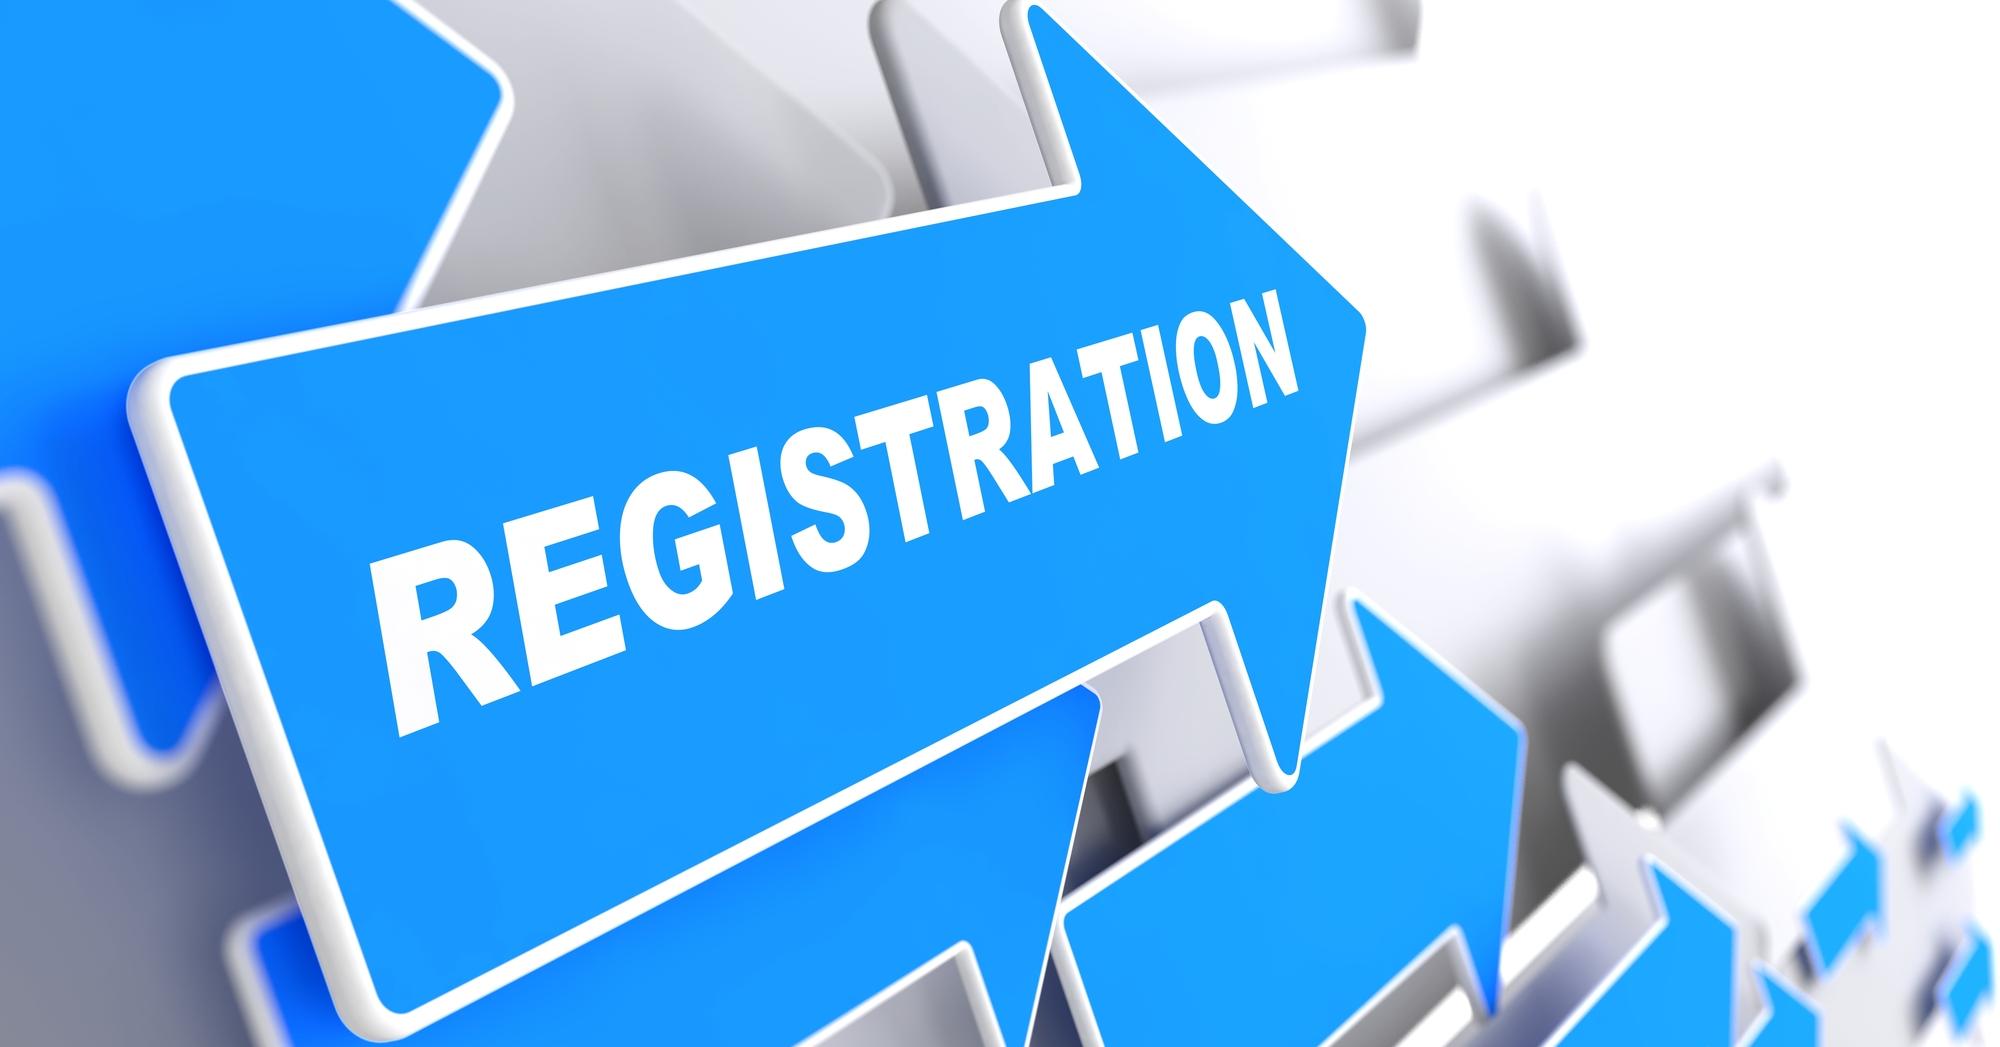 Registration on Blue Arrow.